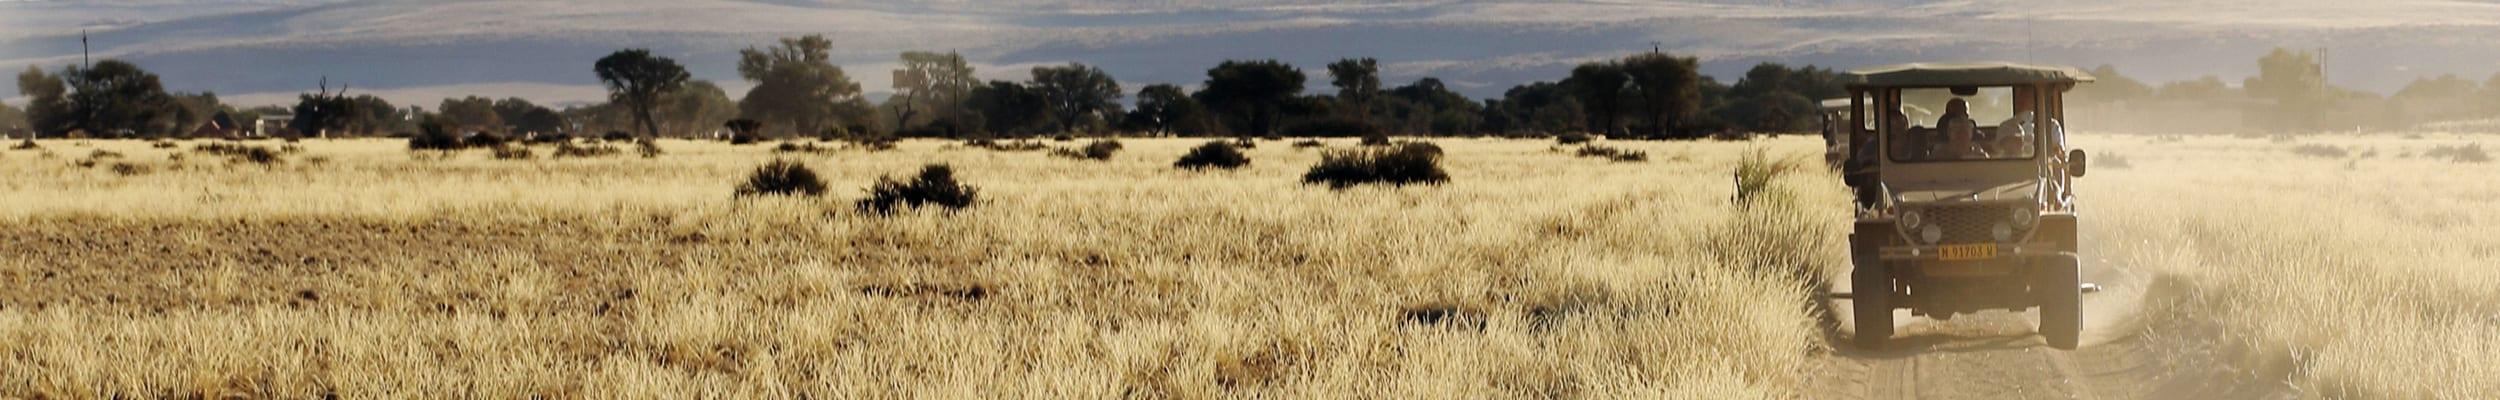 Pilanesberg Reserve